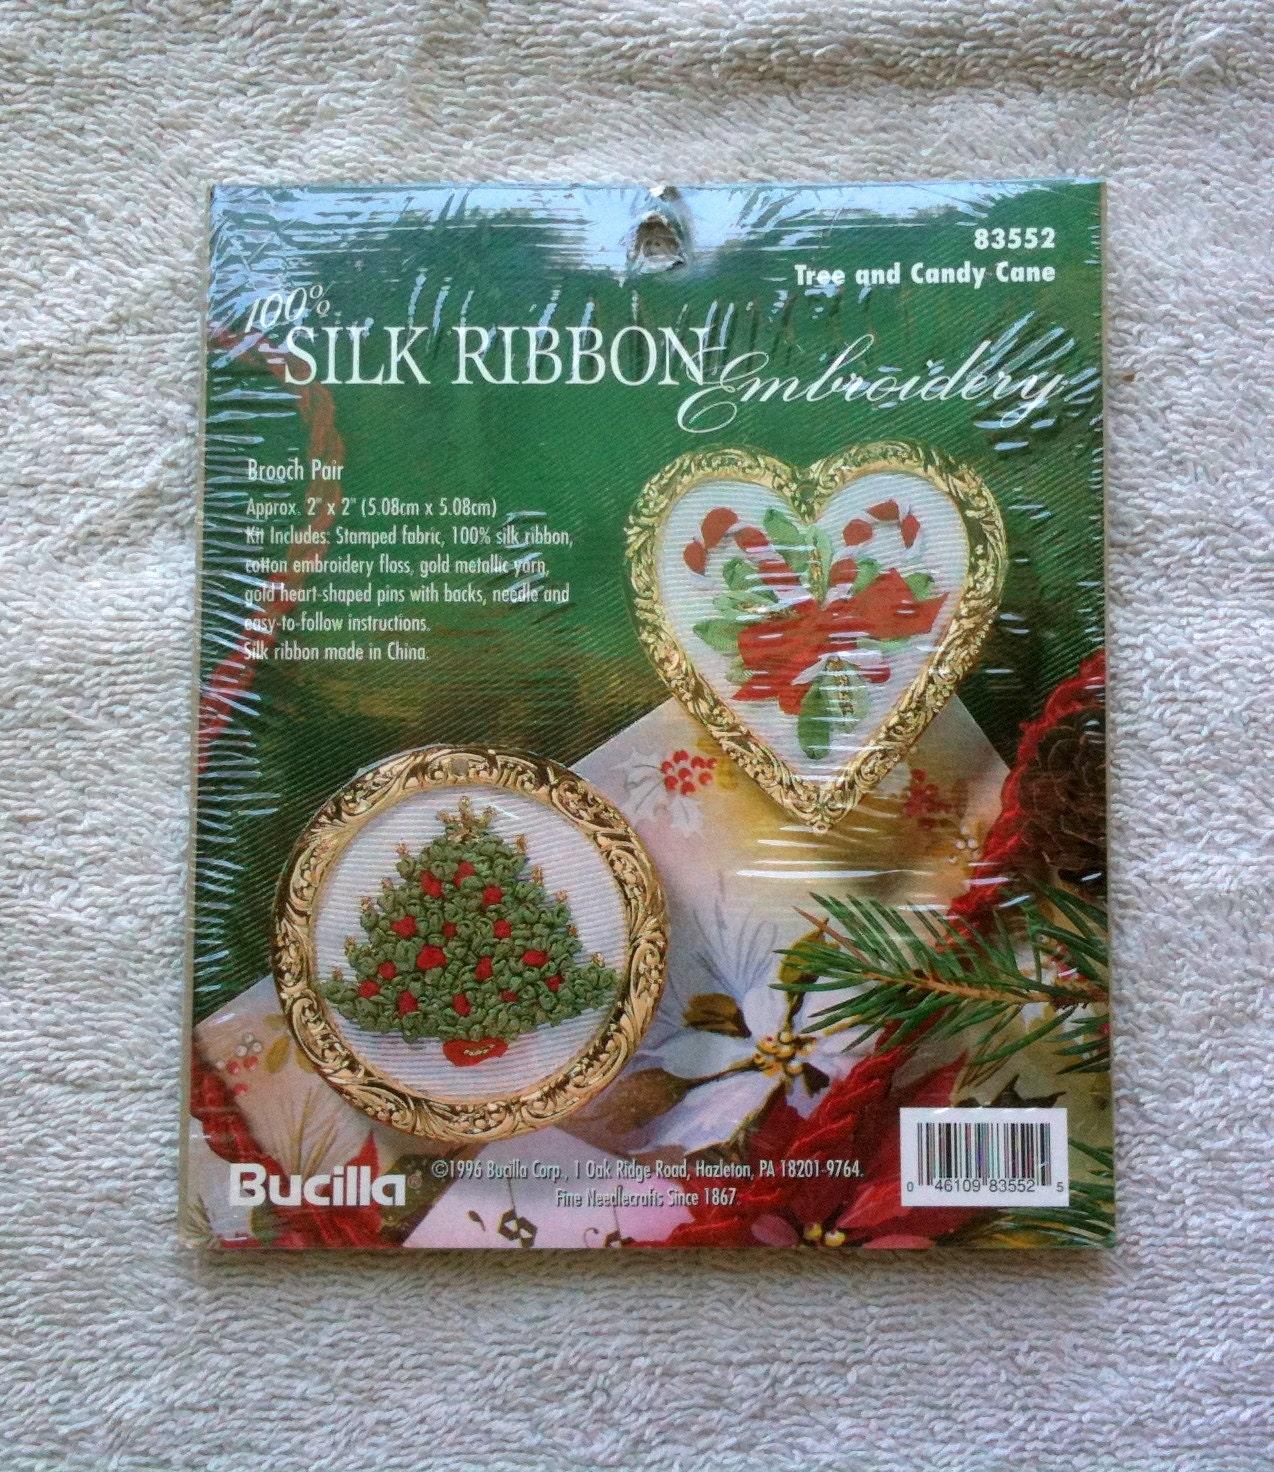 Bucilla silk ribbon embroidery kit christmas brooches